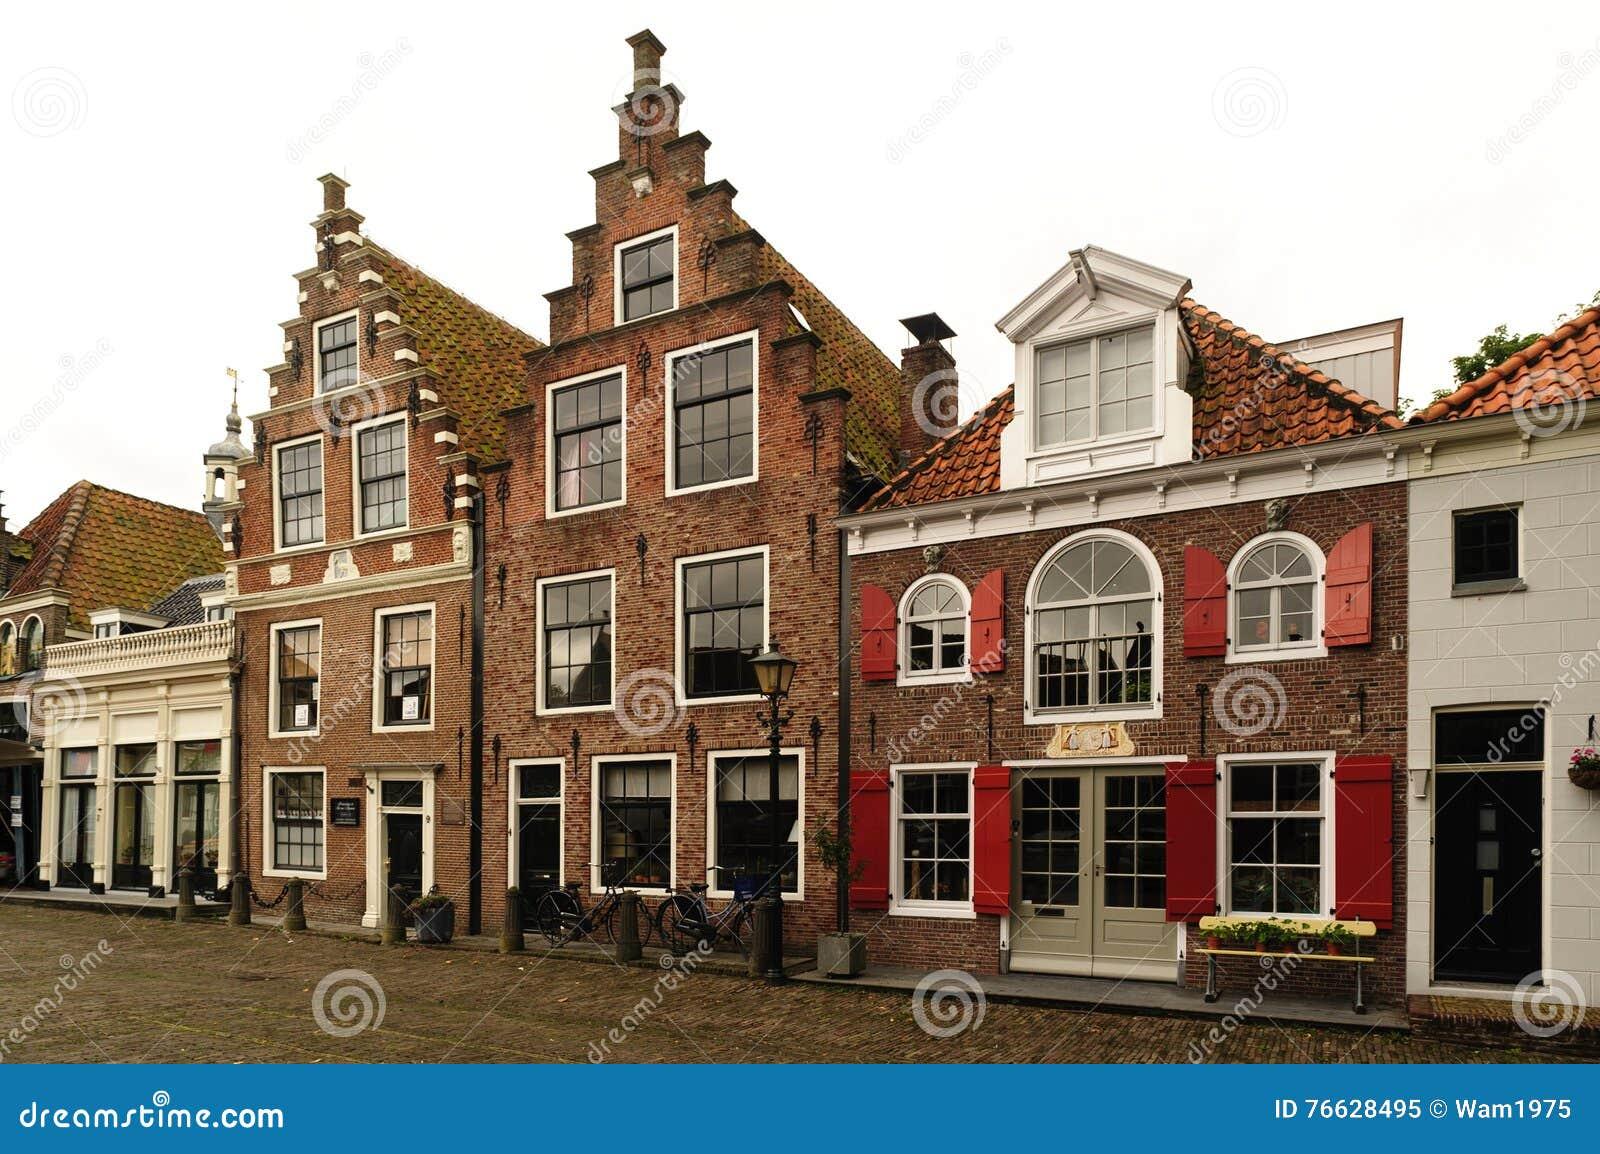 Oud huis in nederland stock afbeelding afbeelding bestaande uit achtergrond 76628495 - Lay outs oud huis ...